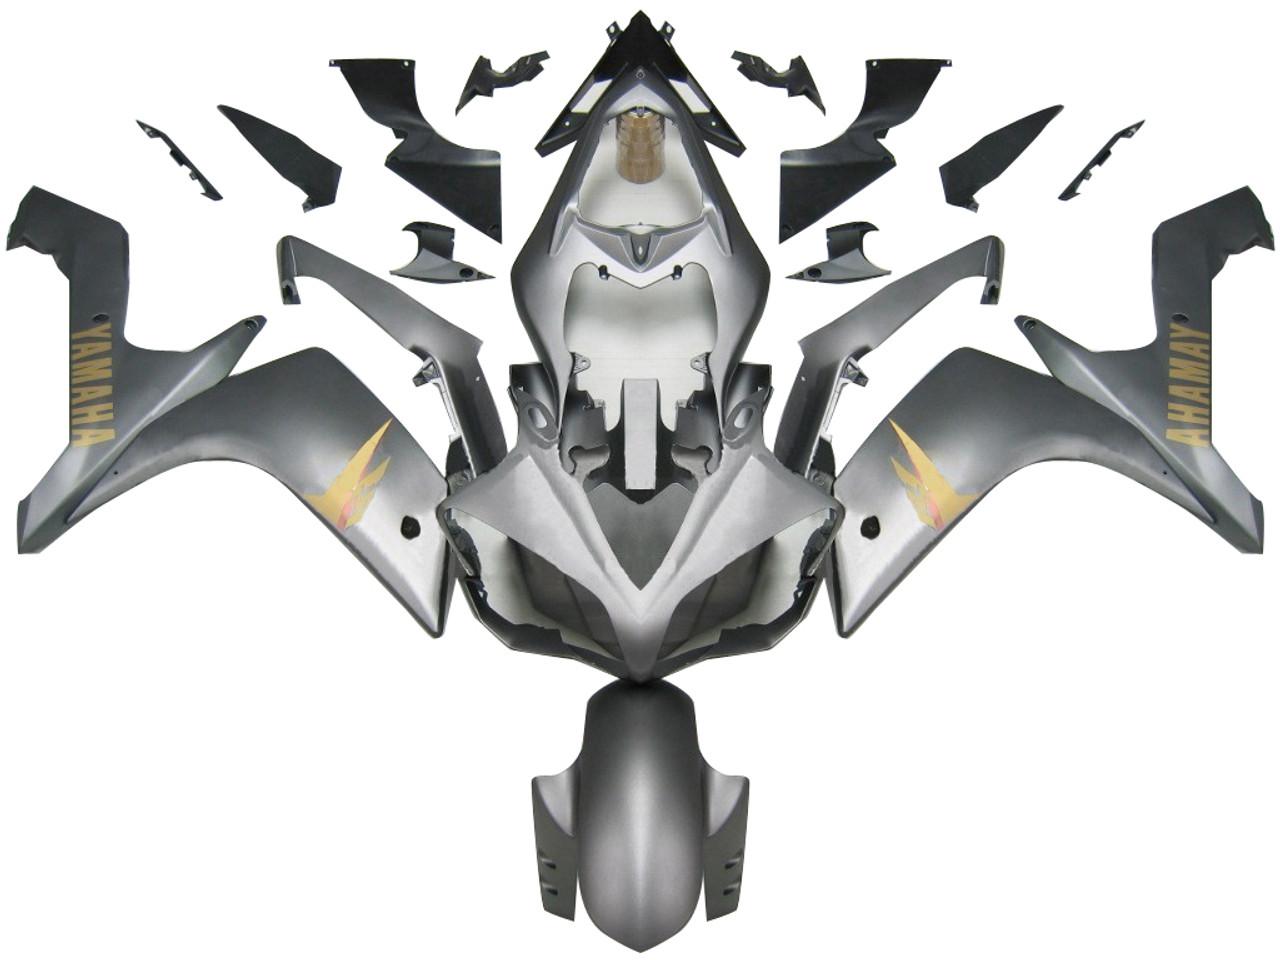 Fairings Yamaha YZF-R1 Silver Matte R1 Racing (2007-2008)